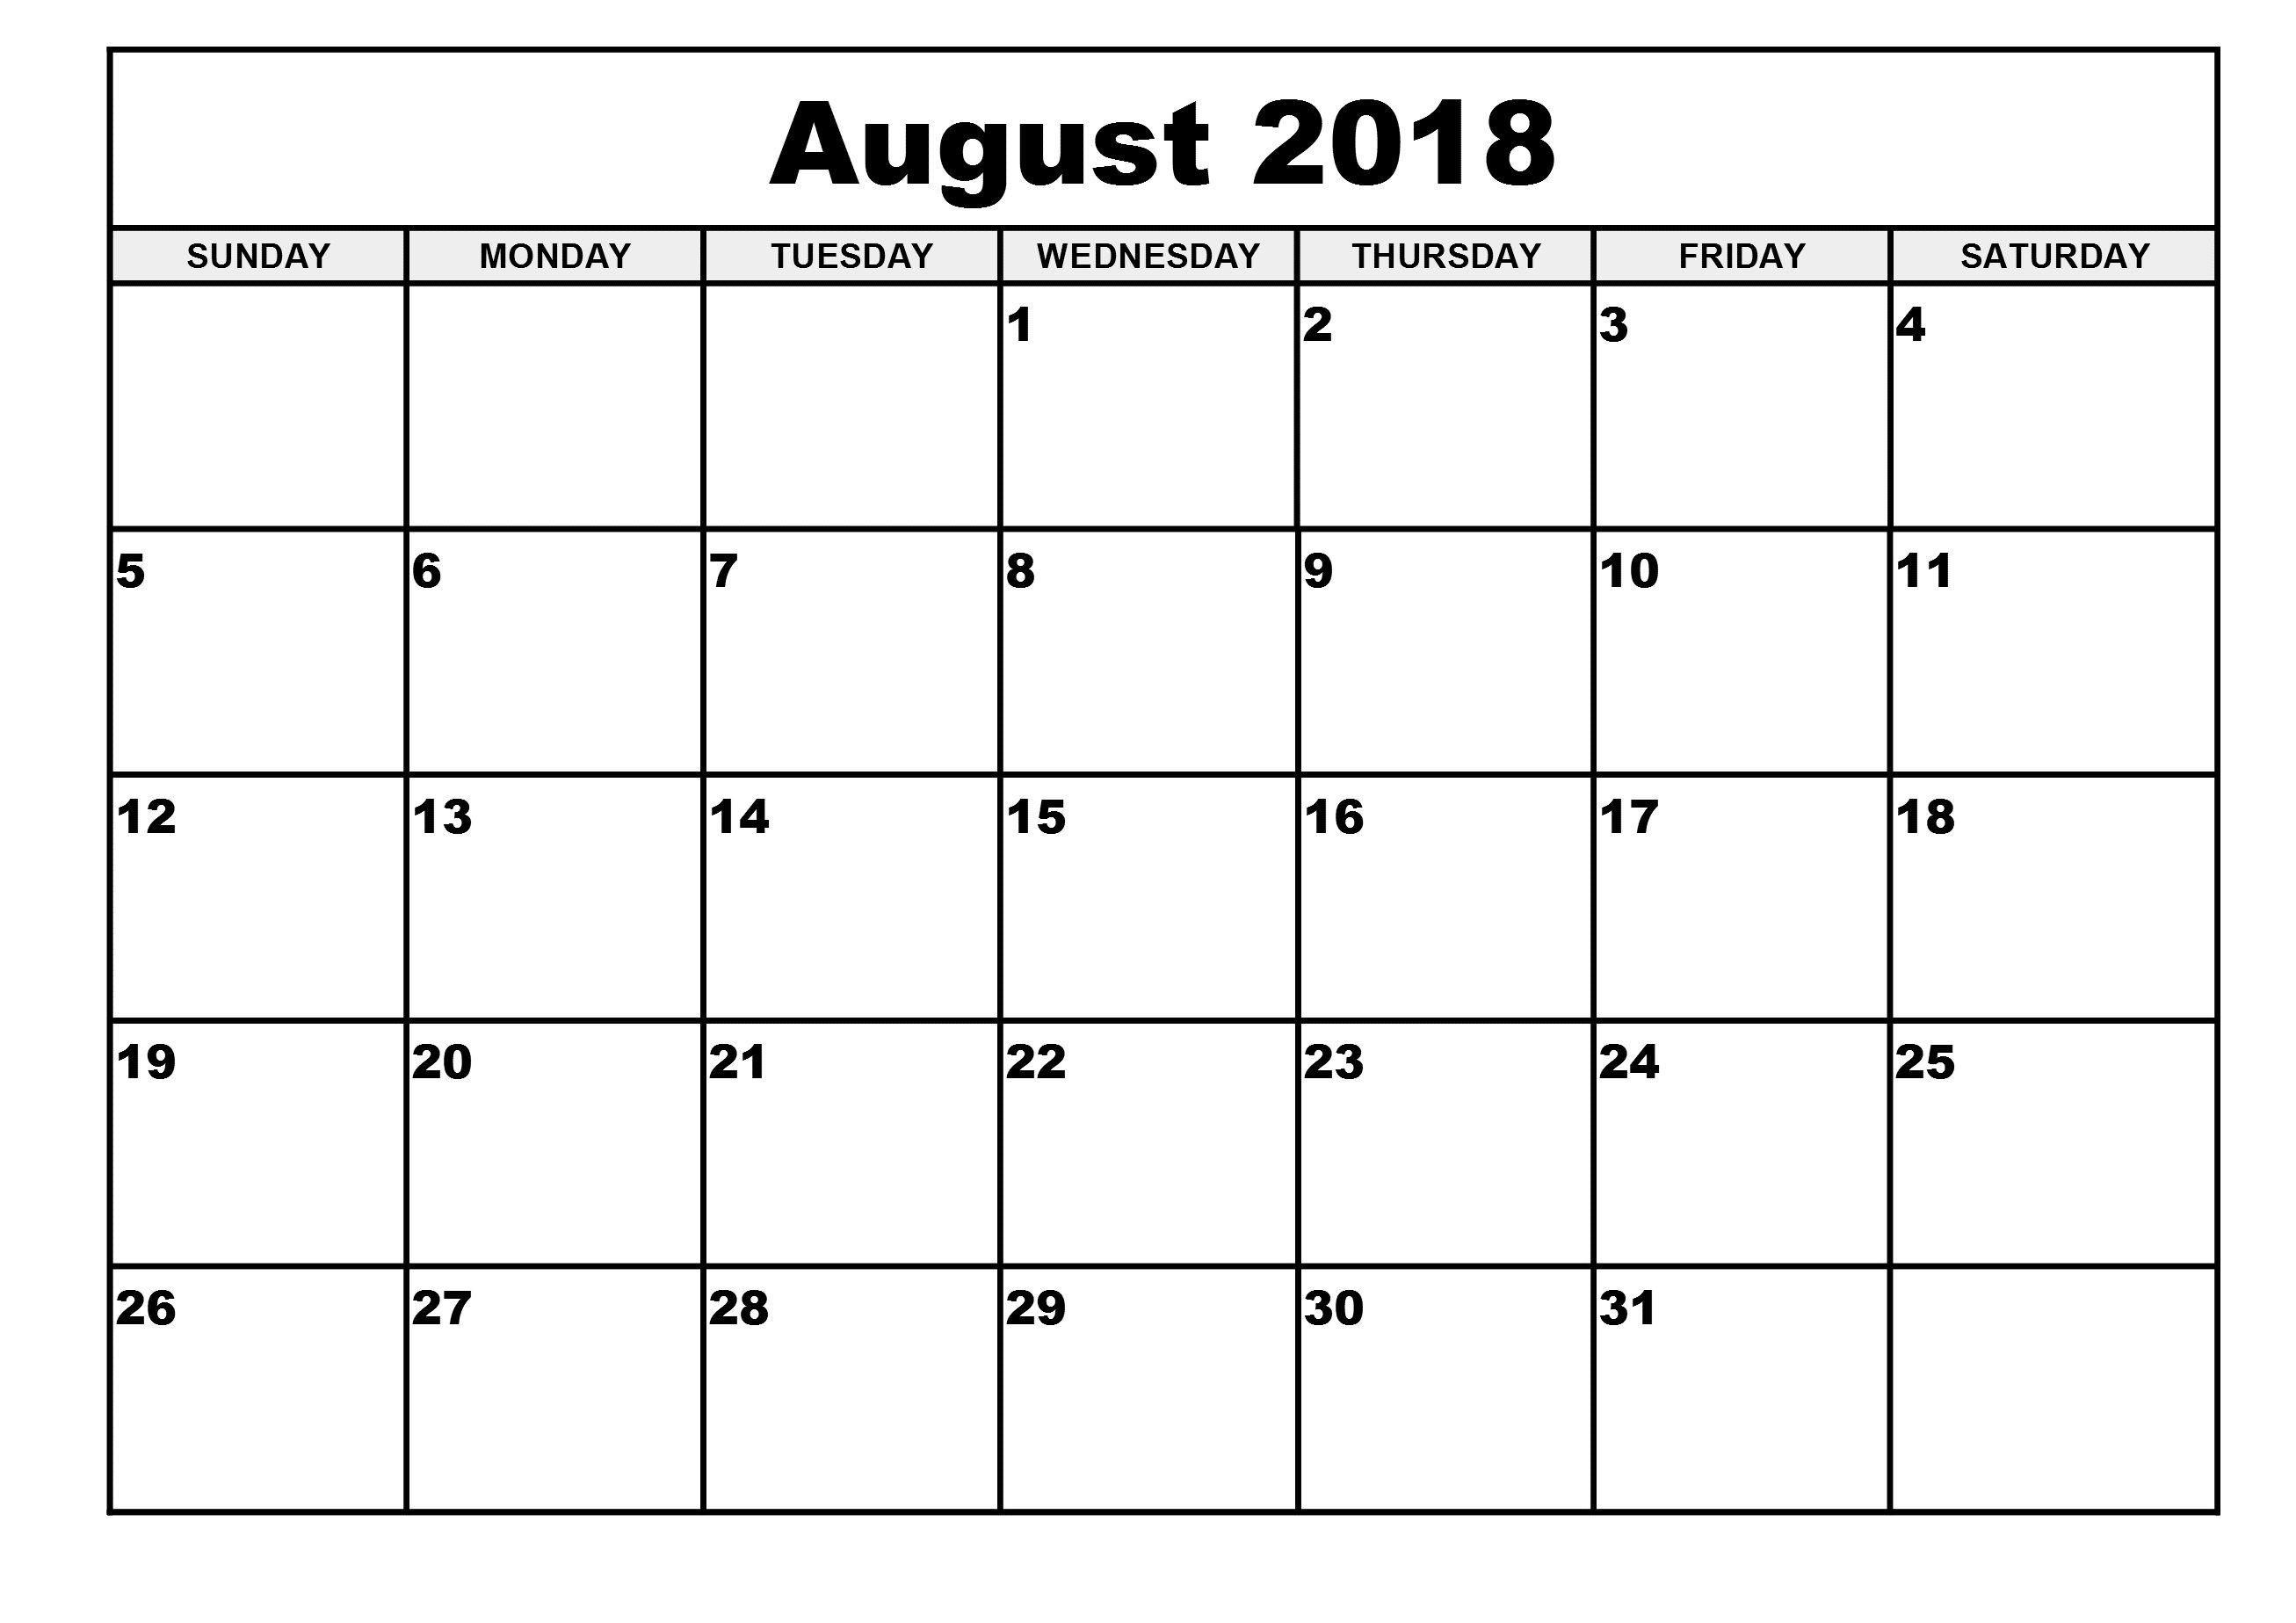 August Calendar 2018 Printable Worksheet Free August 2018 Calendar